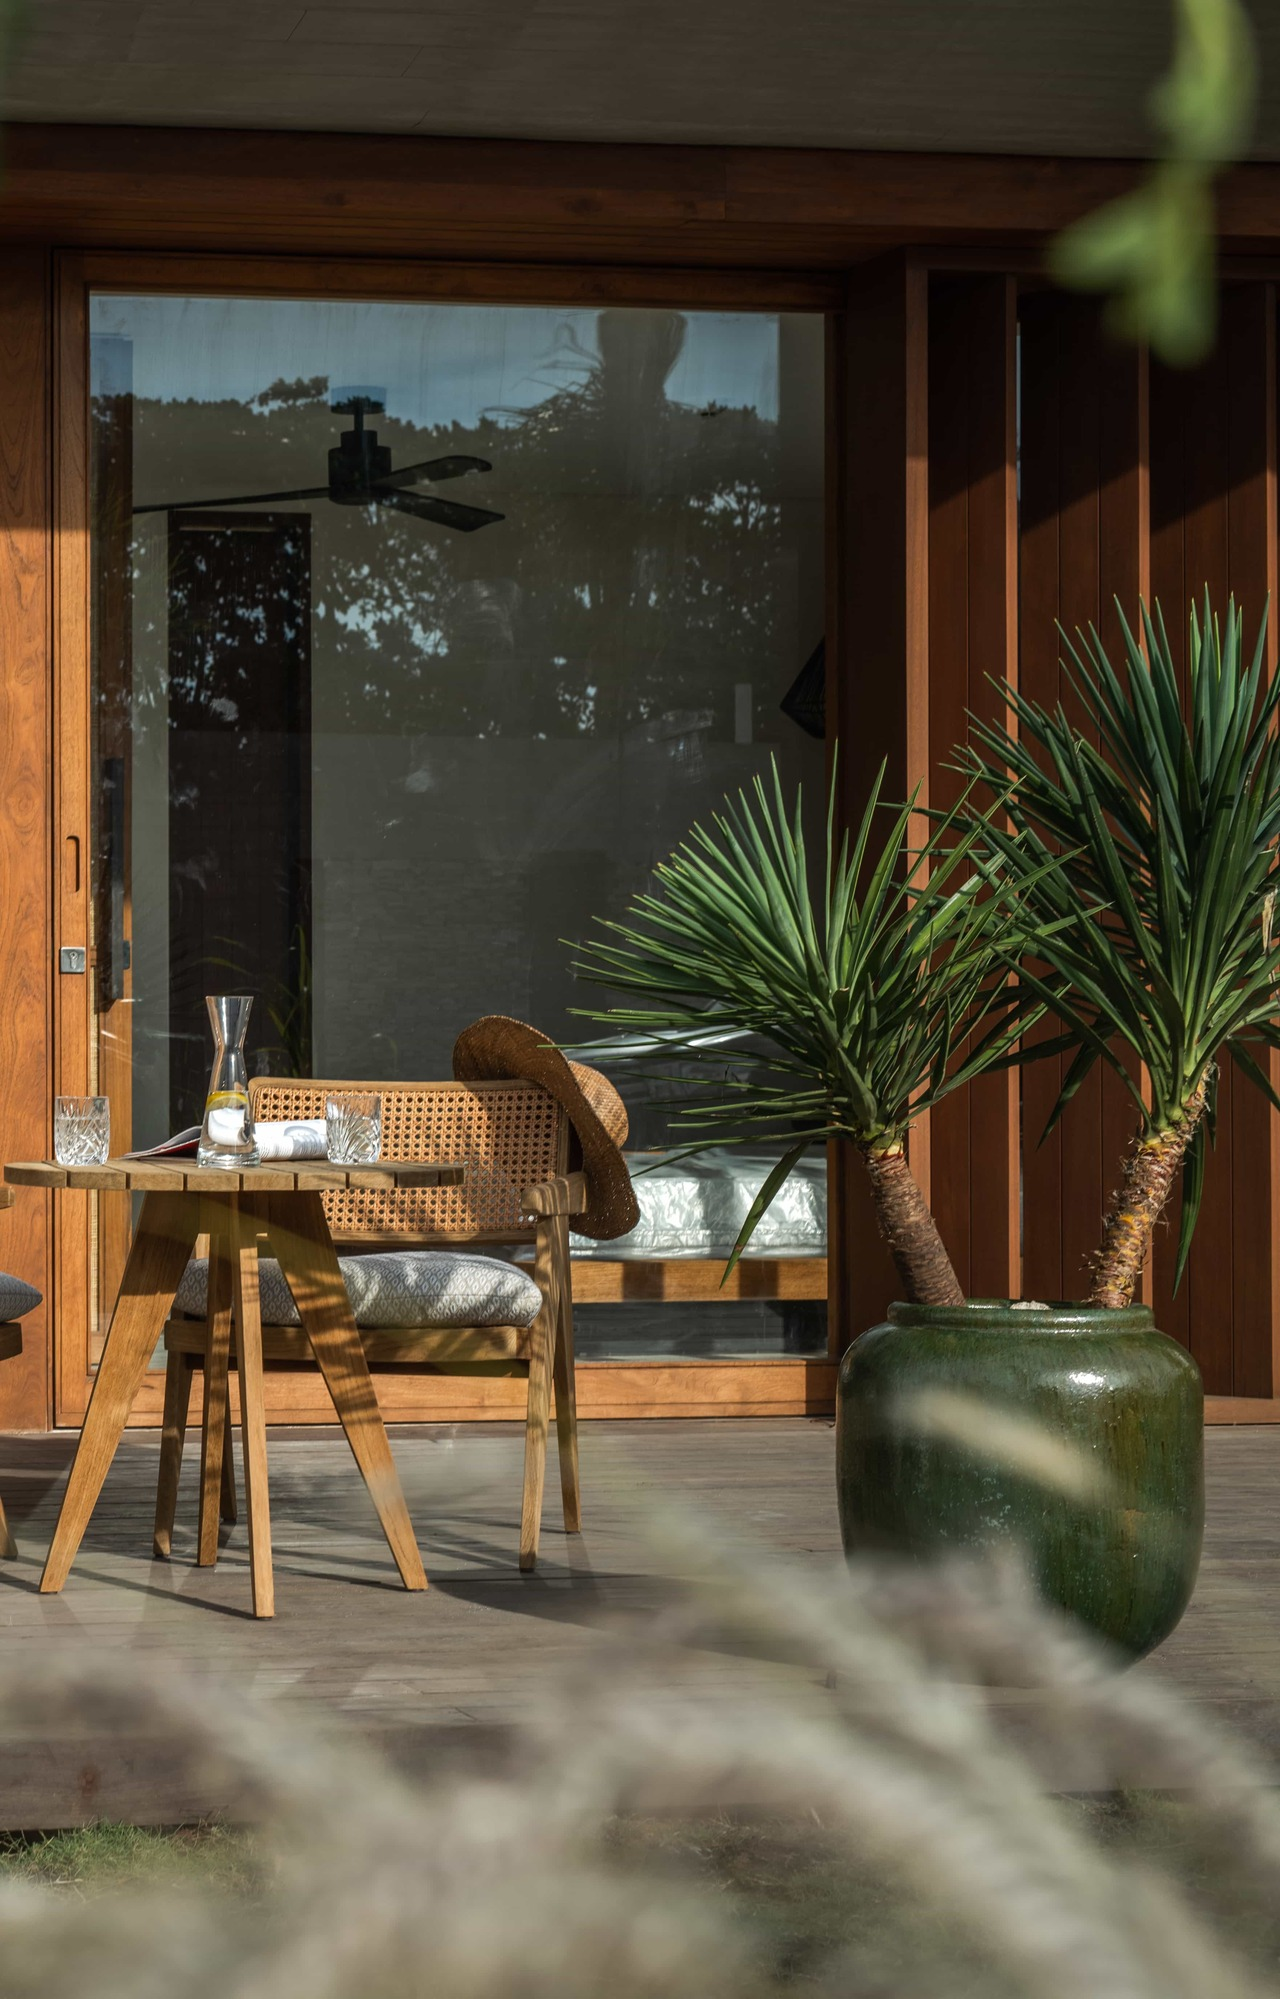 CapKaroso-suite-terrace-table-chair-plant